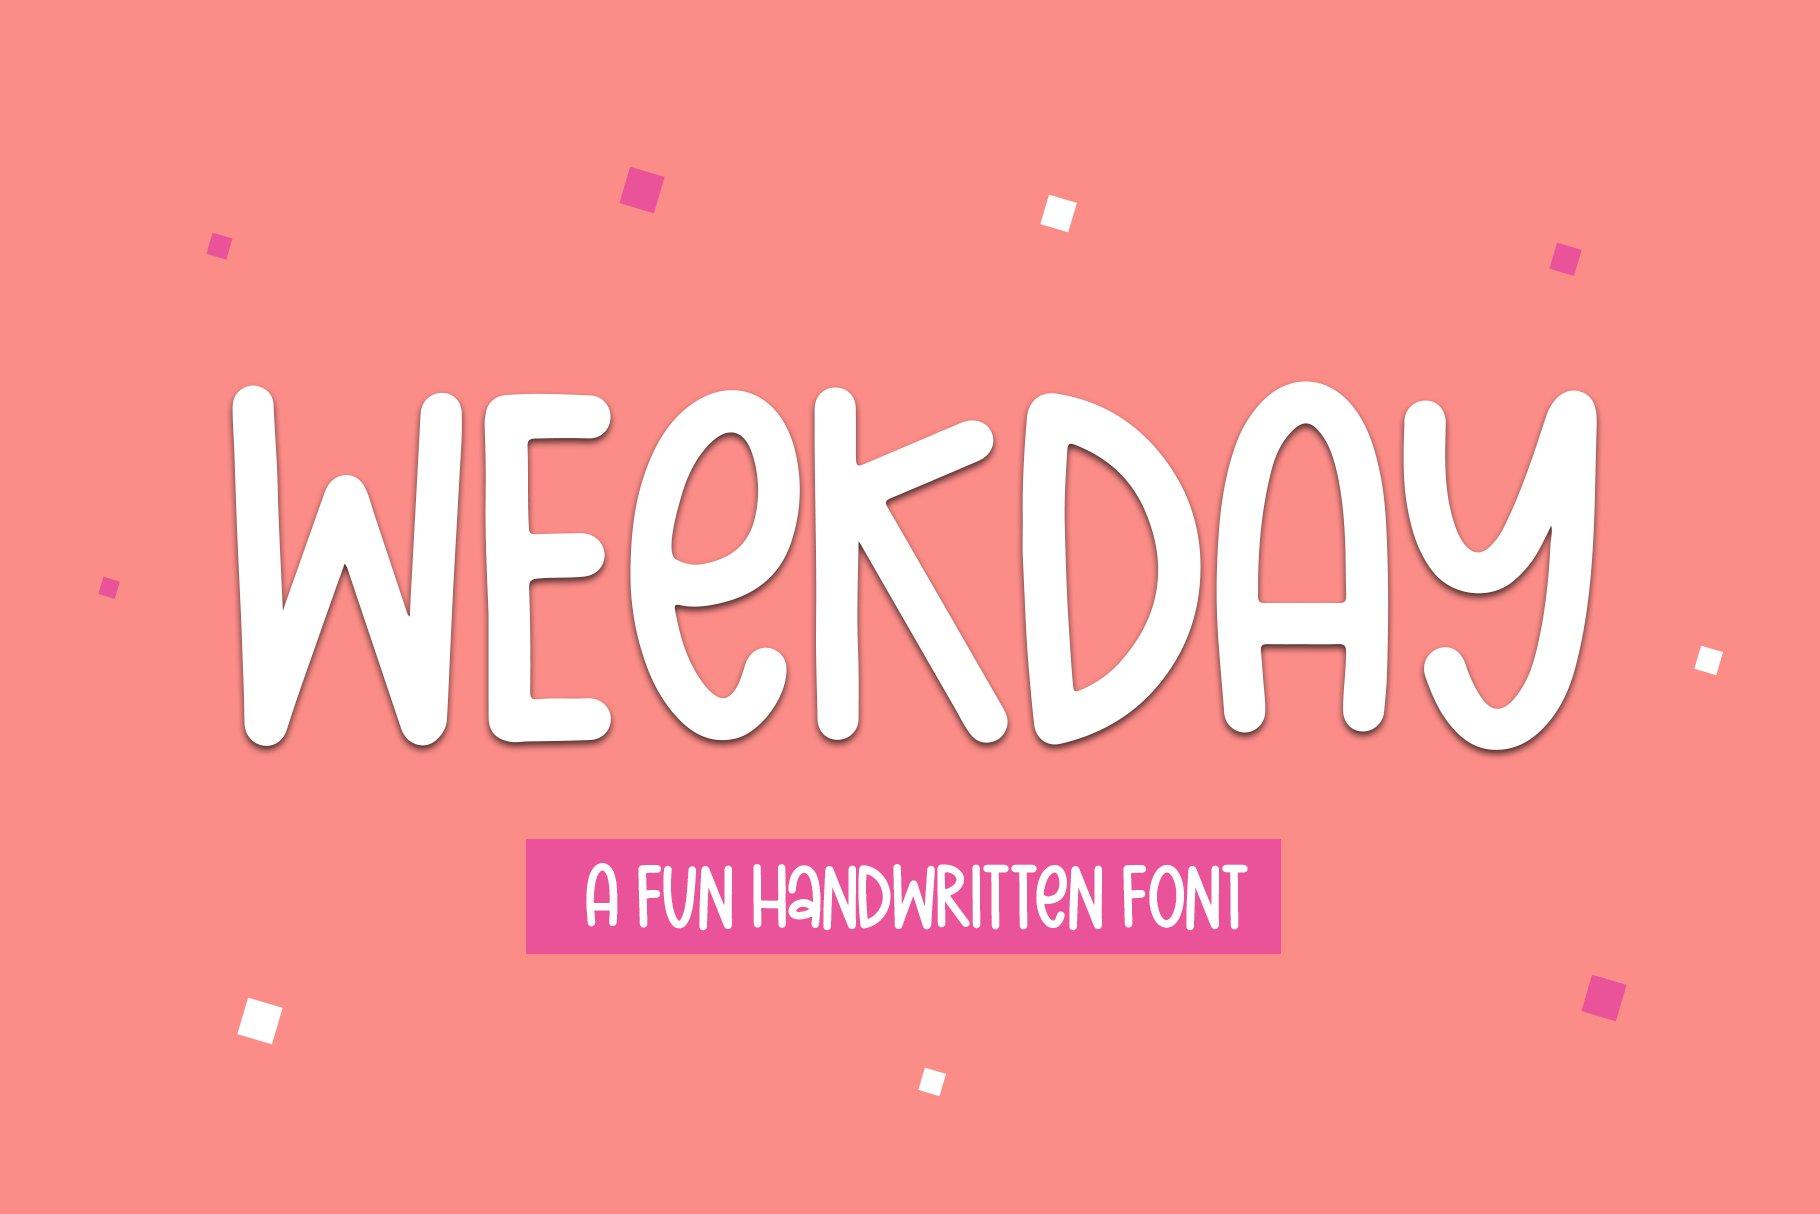 Weekday - A Fun Handwritten Font example image 1